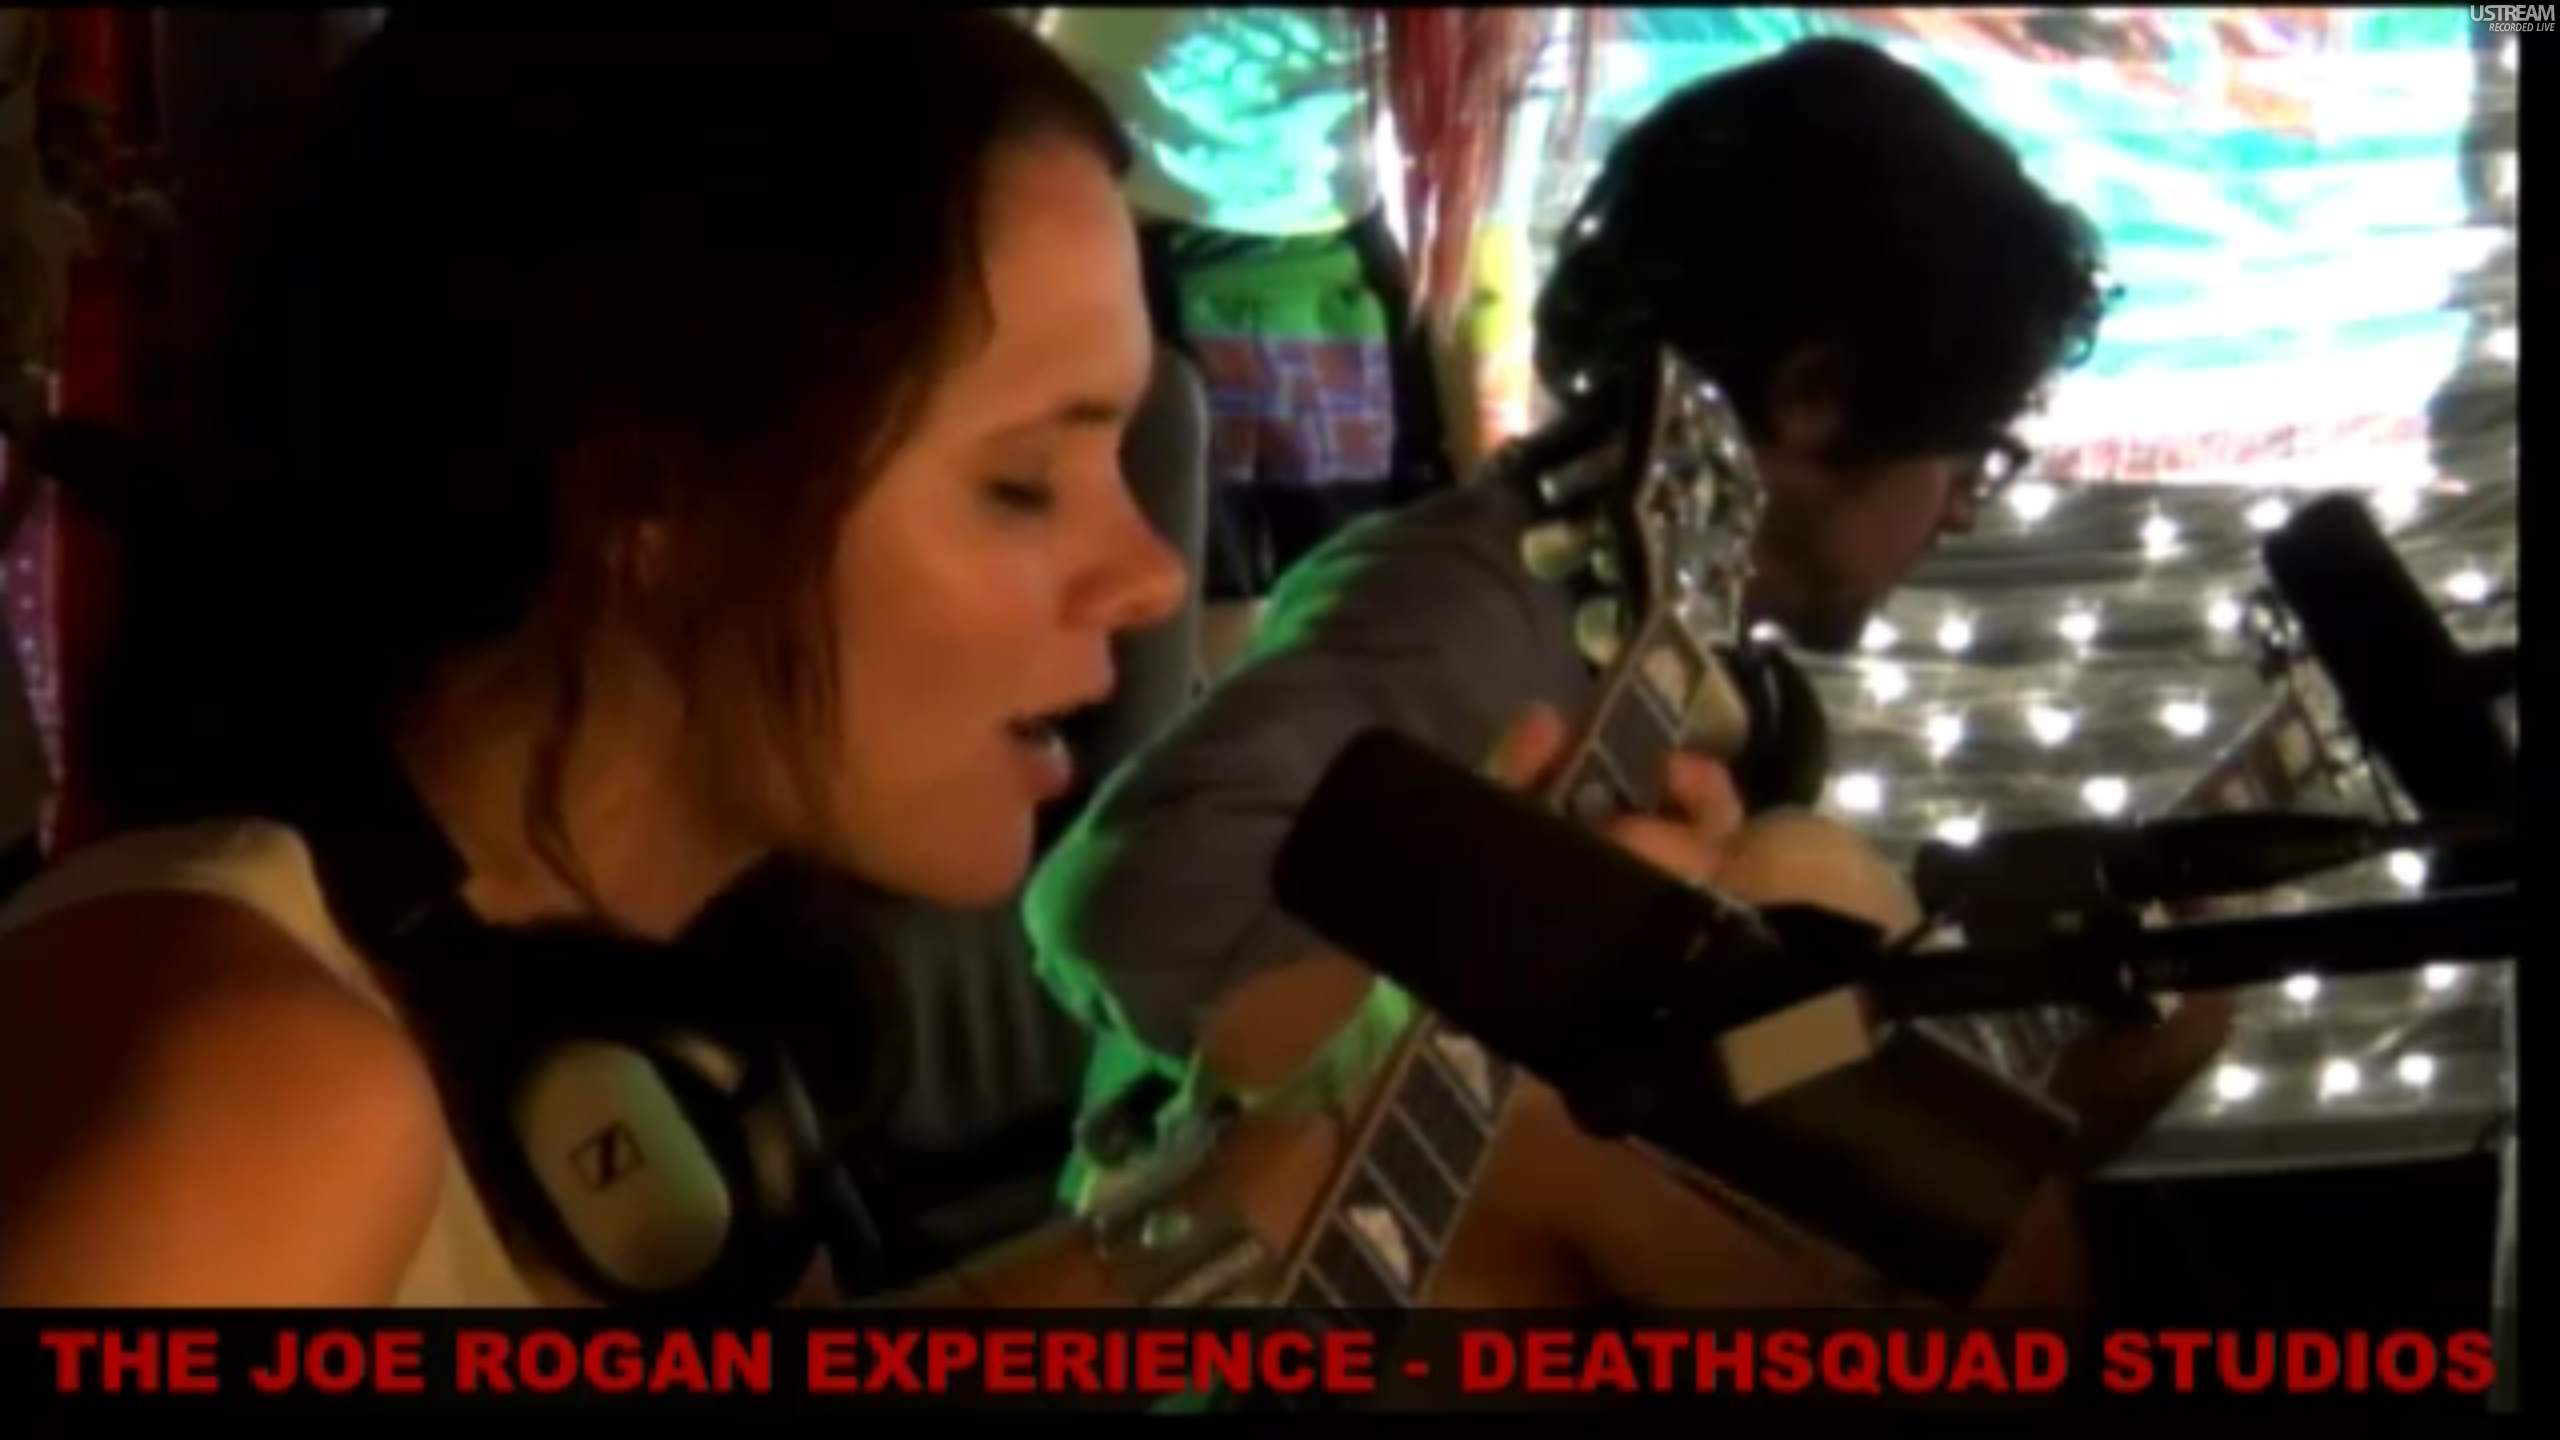 The Joe Rogan Experience #243 - HoneyHoney, Brian Redban